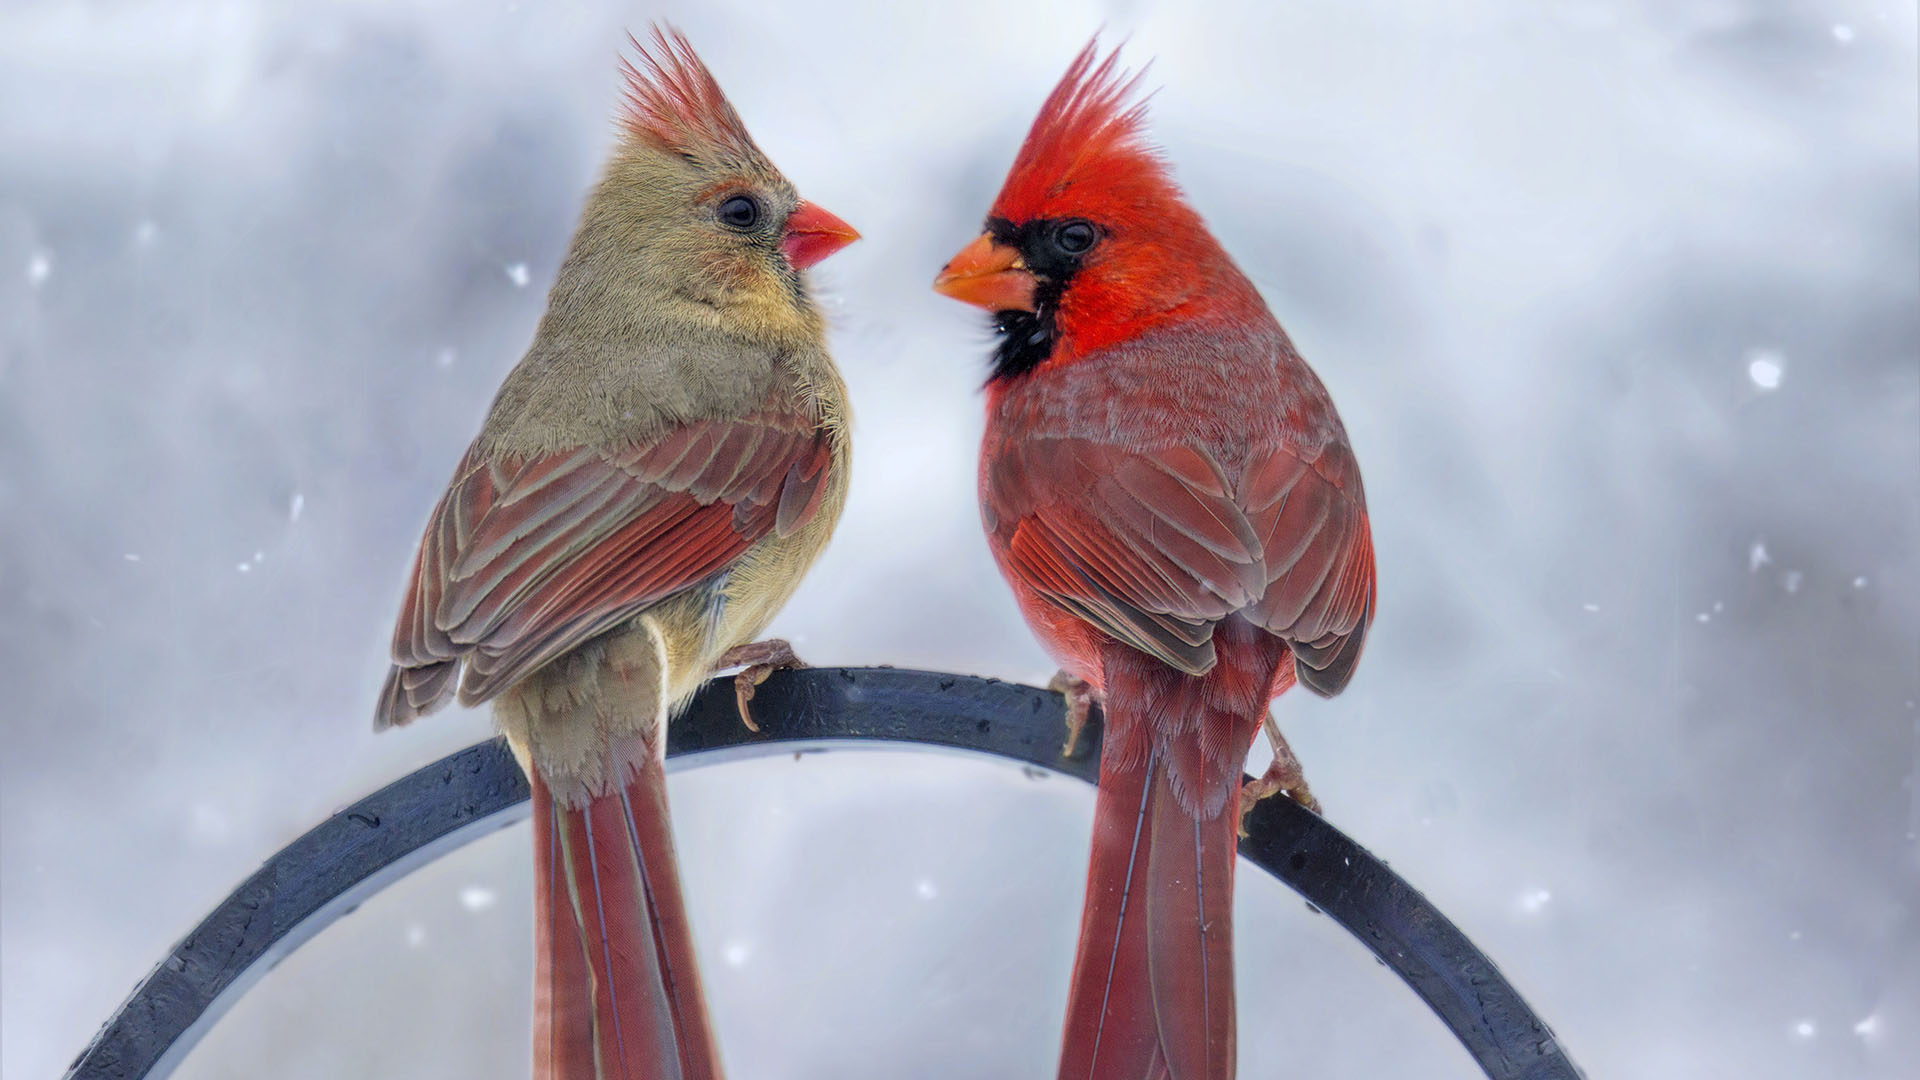 Félig tojó félig hím madarat fotóztak